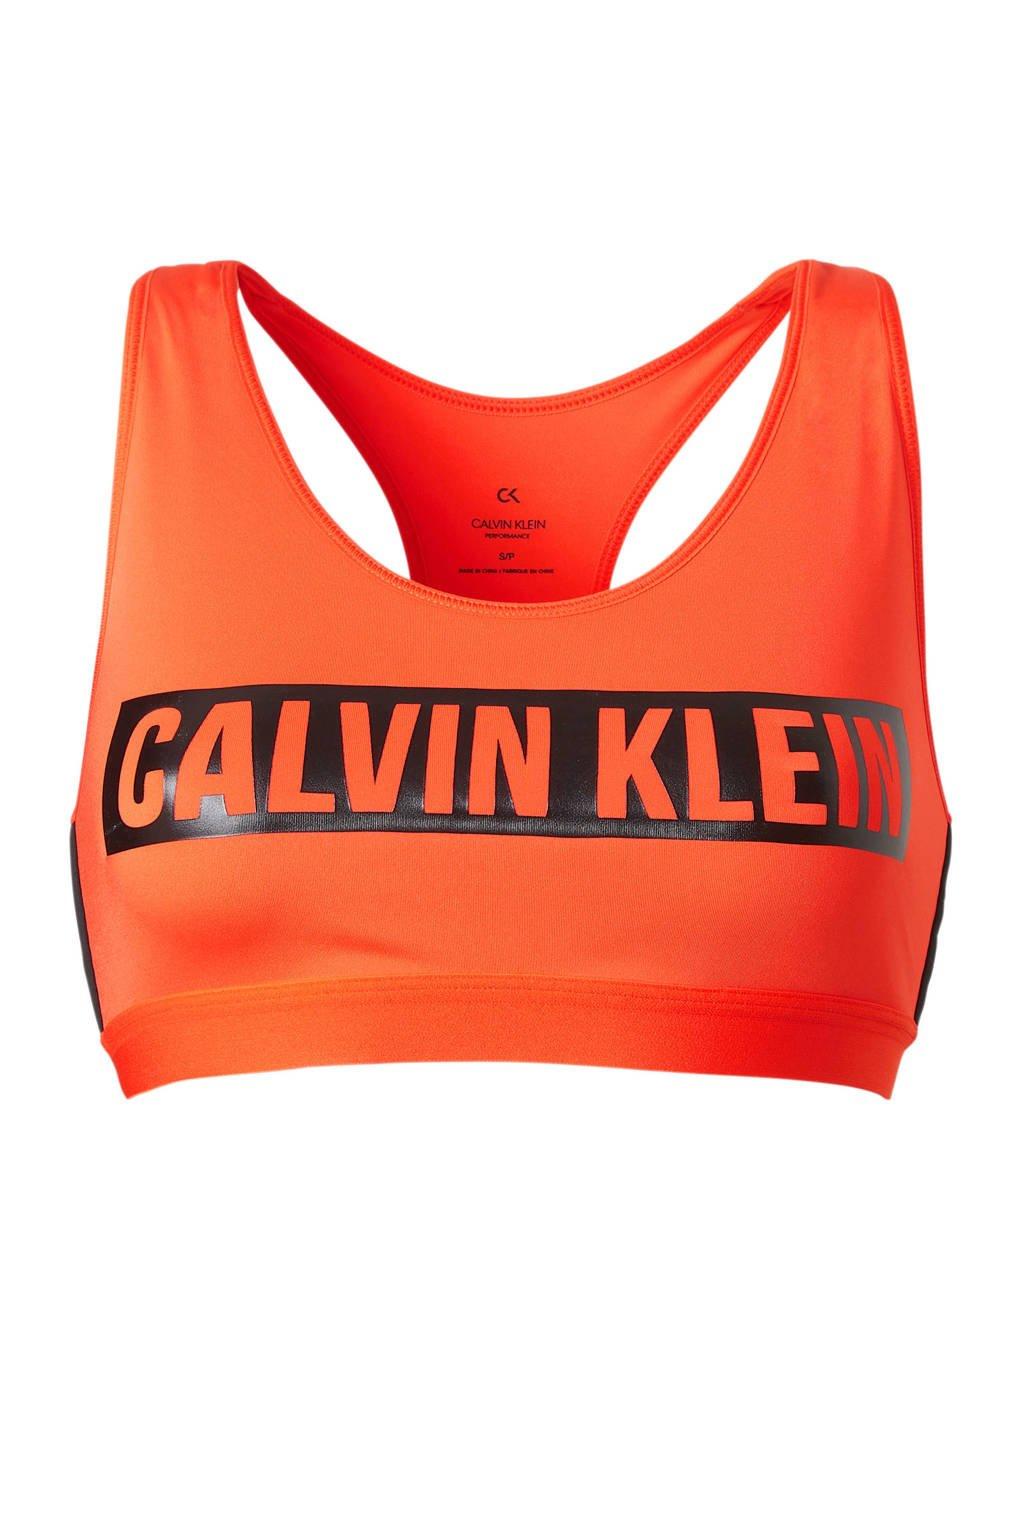 Calvin Klein Performance sportbh, Oranje/zwart